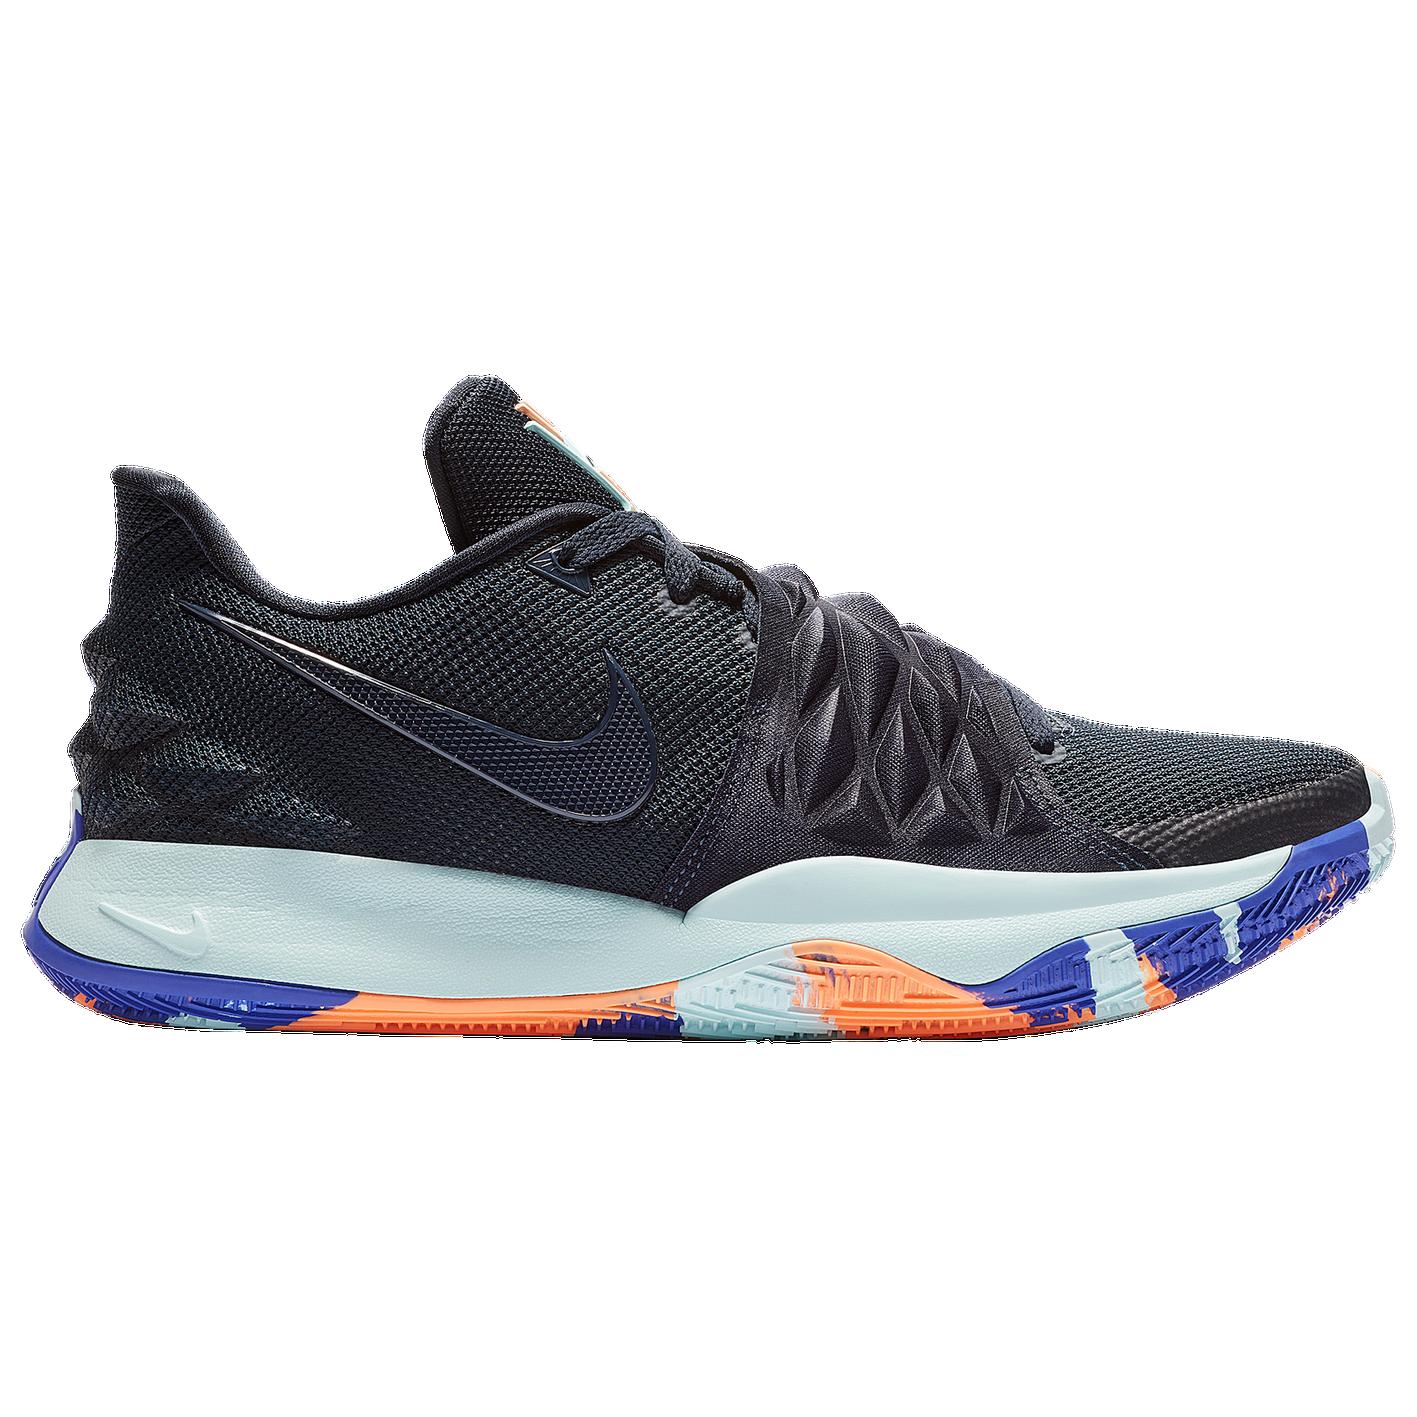 sports shoes 2428f 6e63f Nike Kyrie 4 Low - Men s